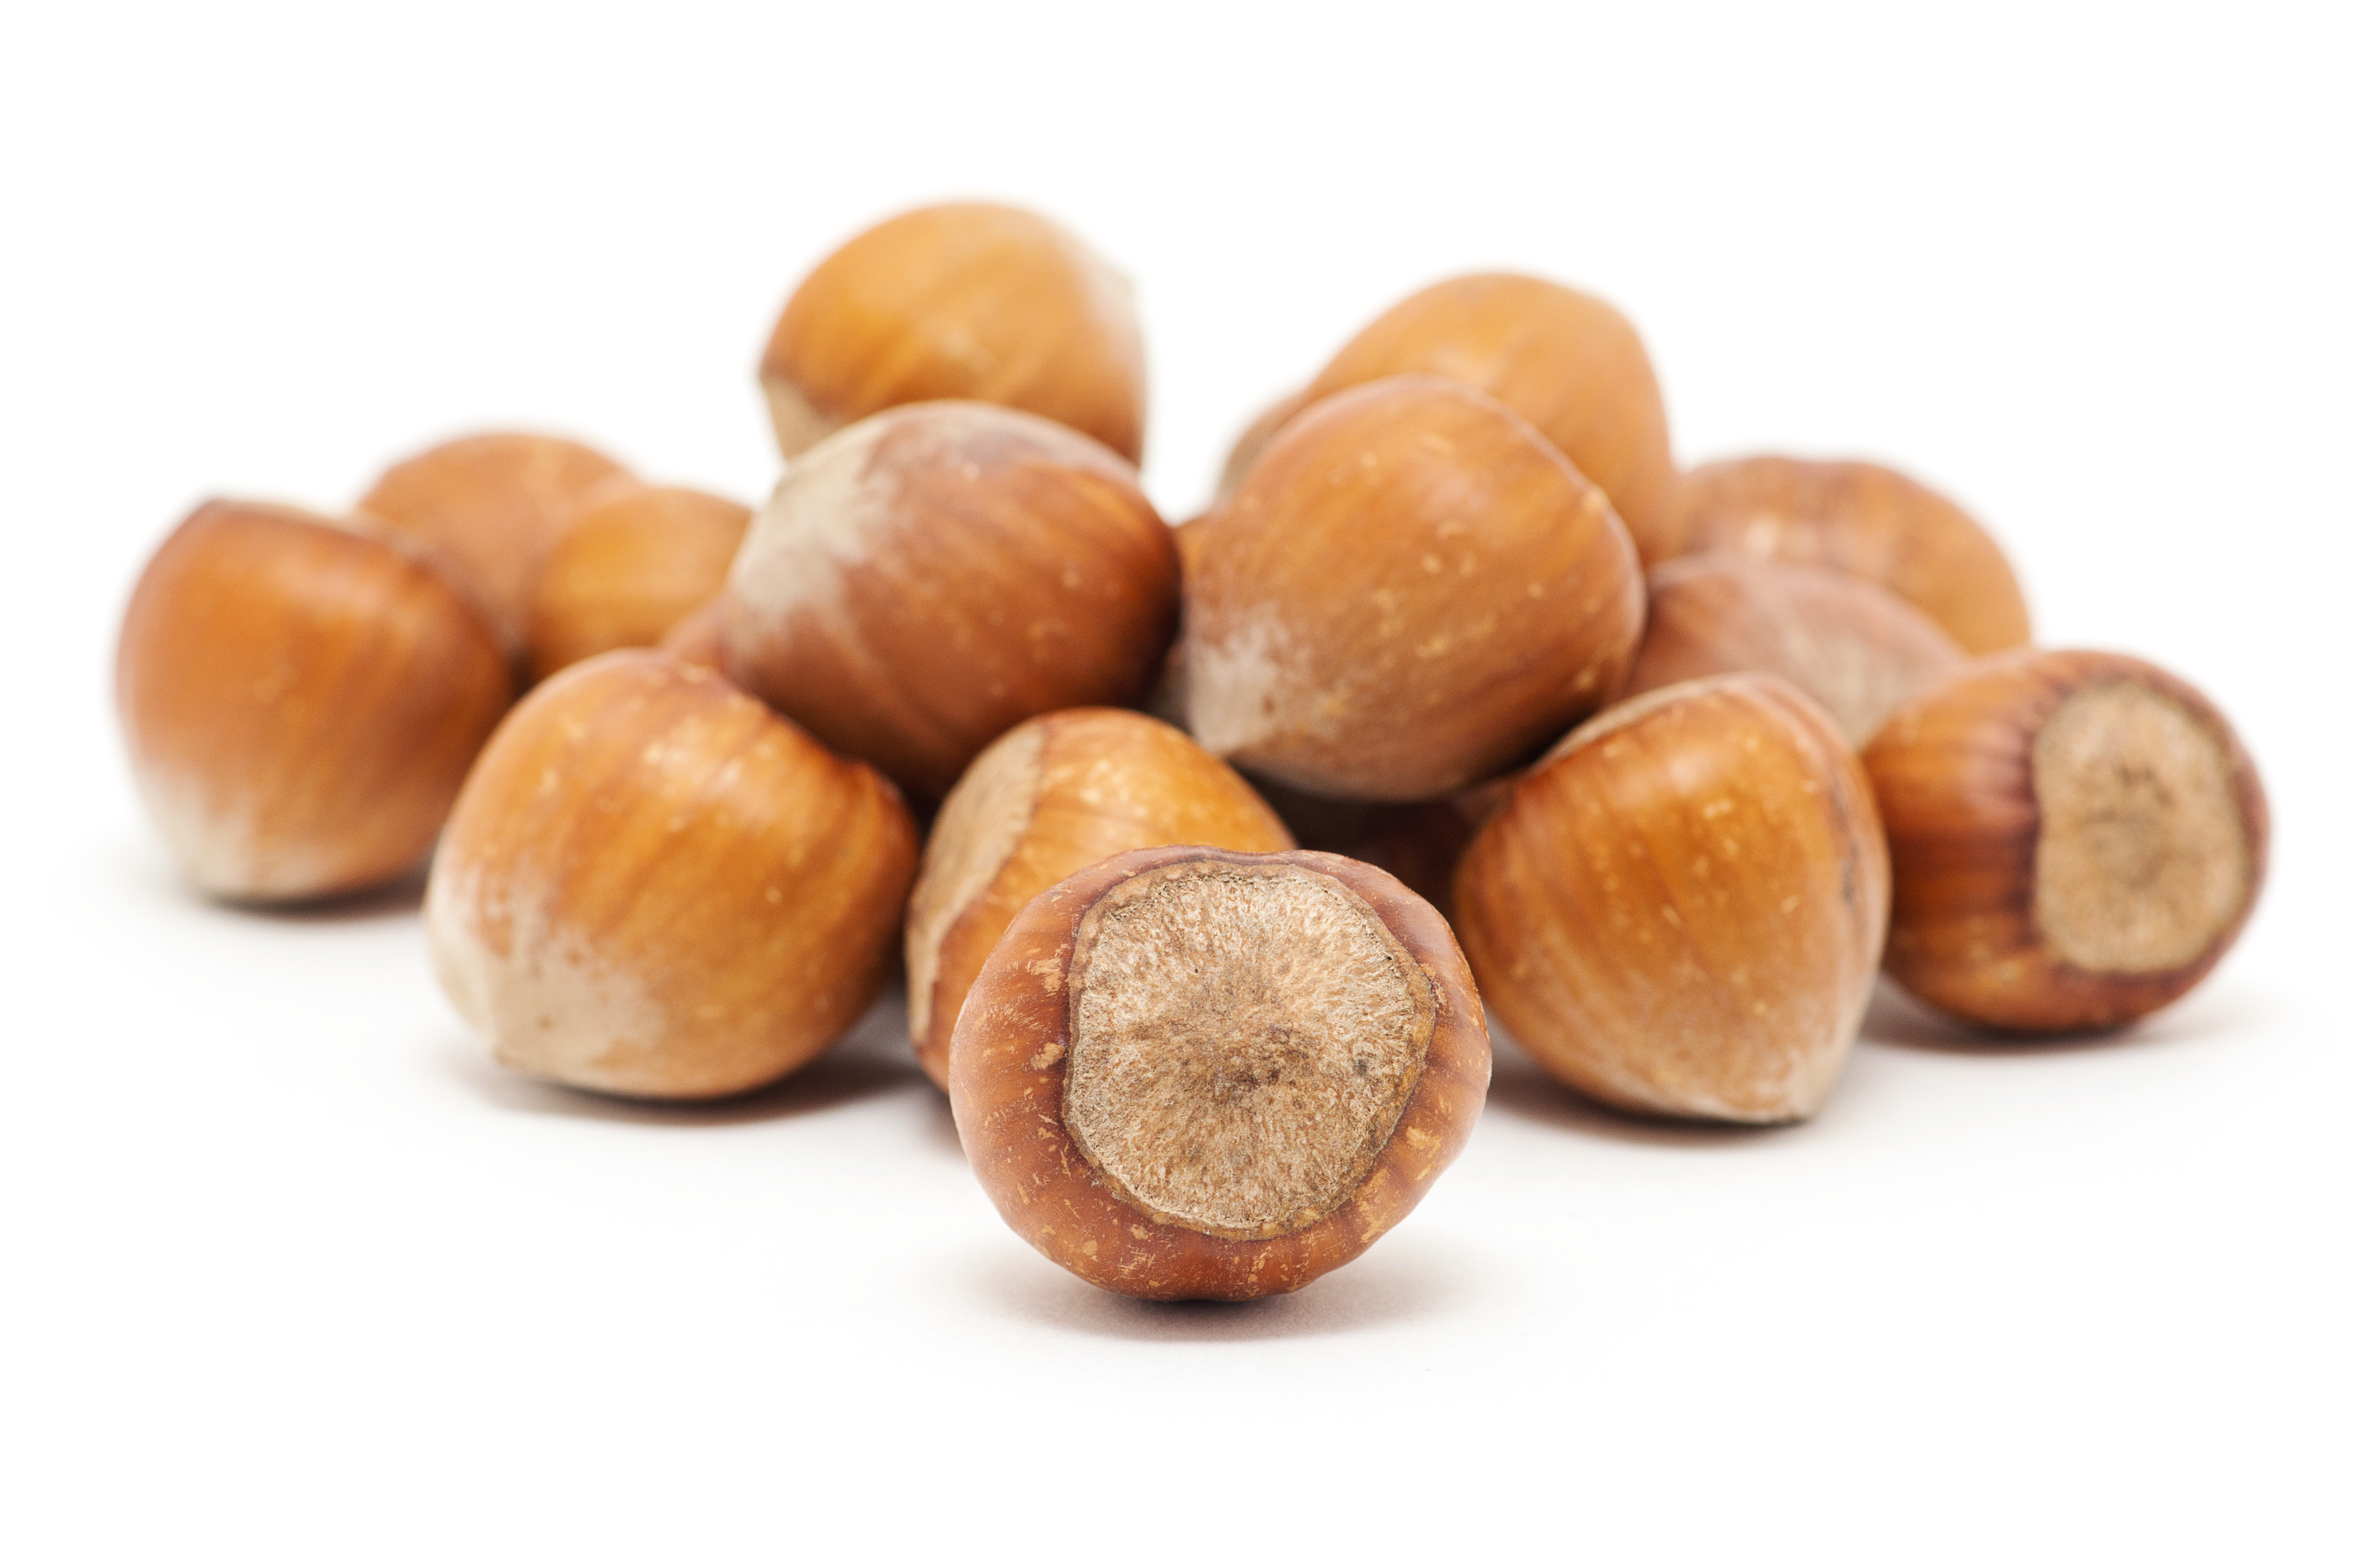 Hazelnuts-on-white-background-4928x3264-300-DPI-shutterstock_422474713